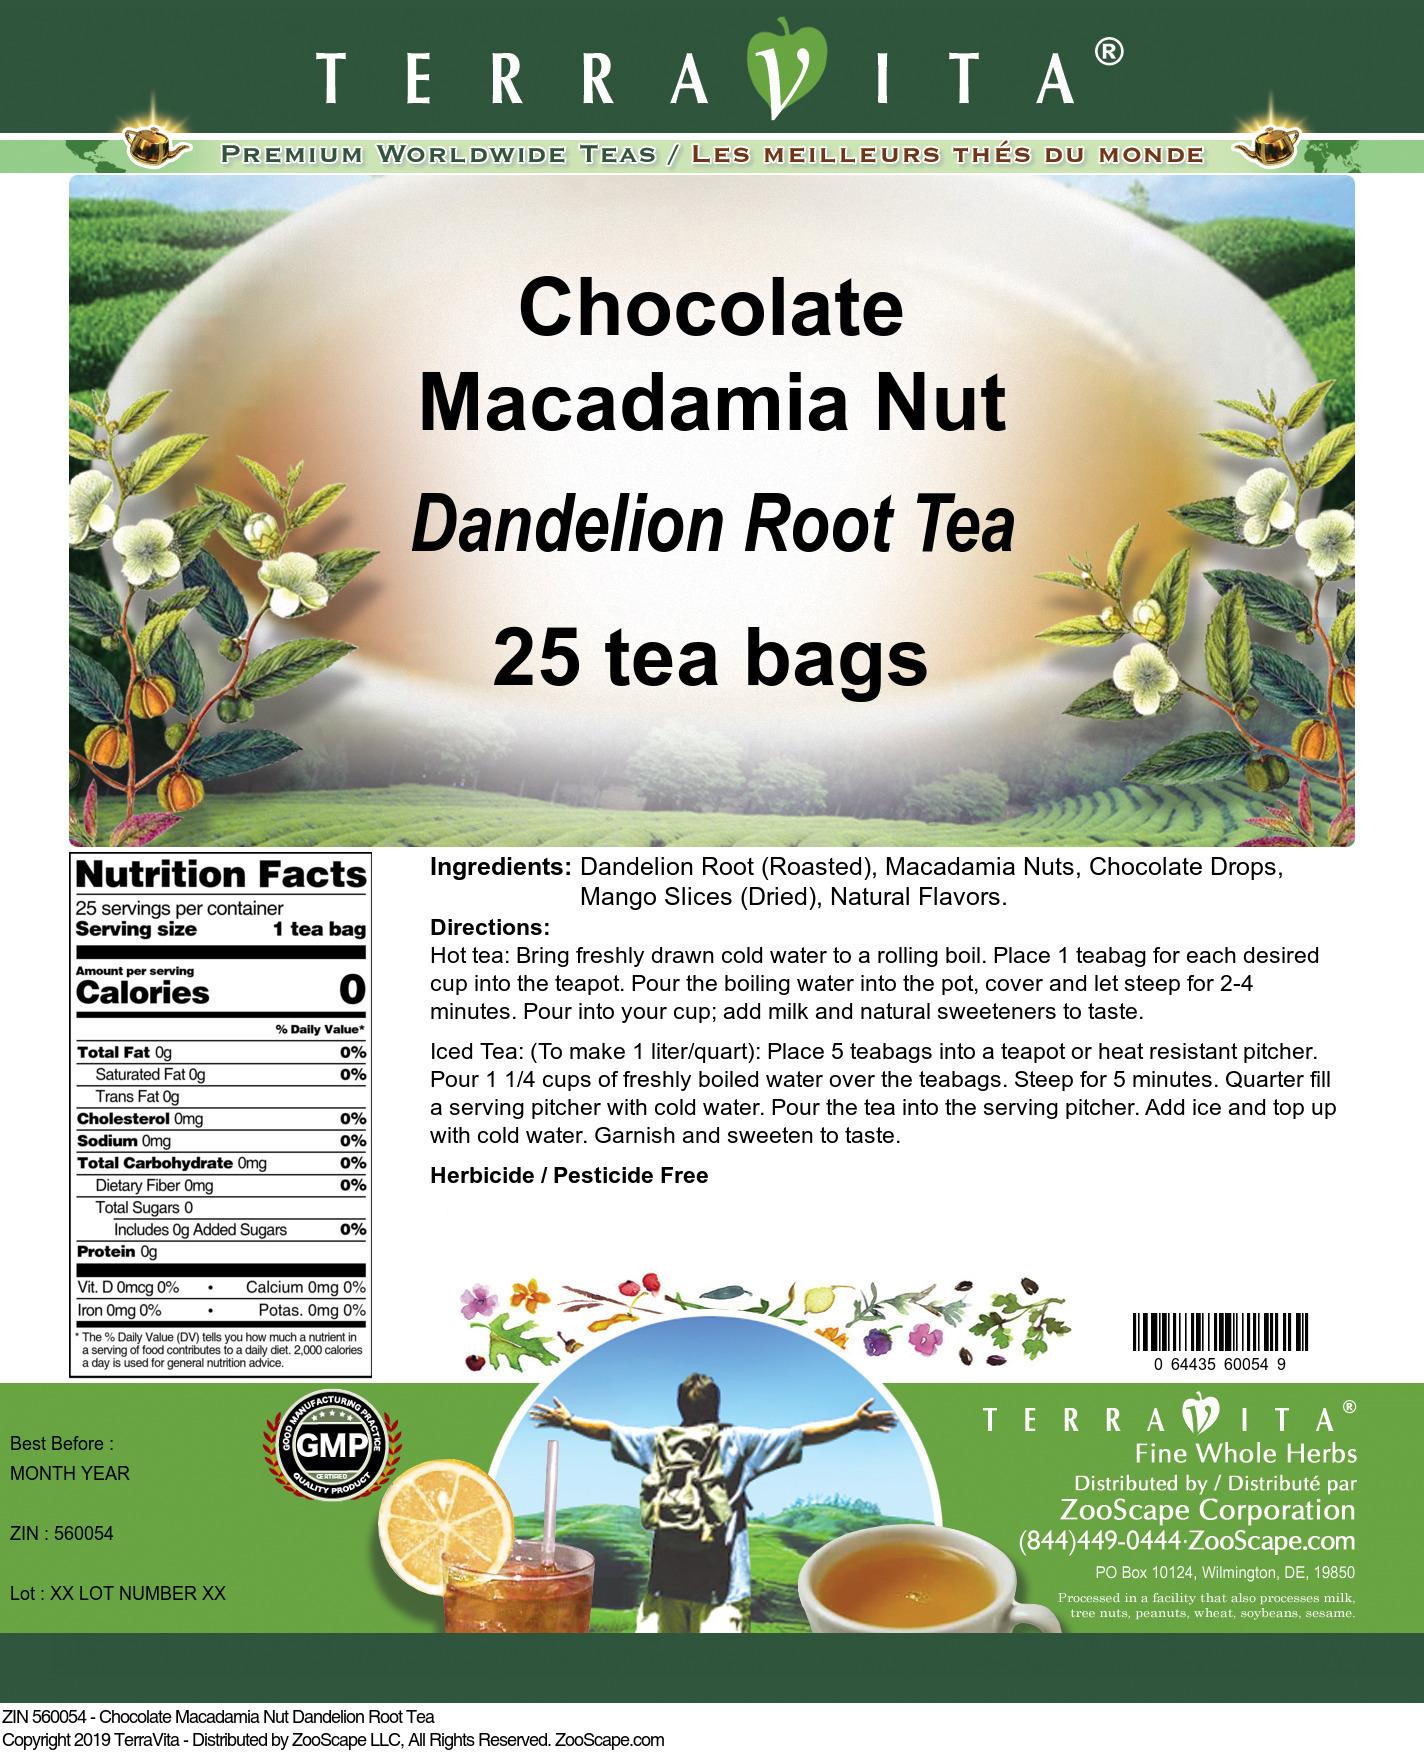 Chocolate Macadamia Nut Dandelion Root Tea